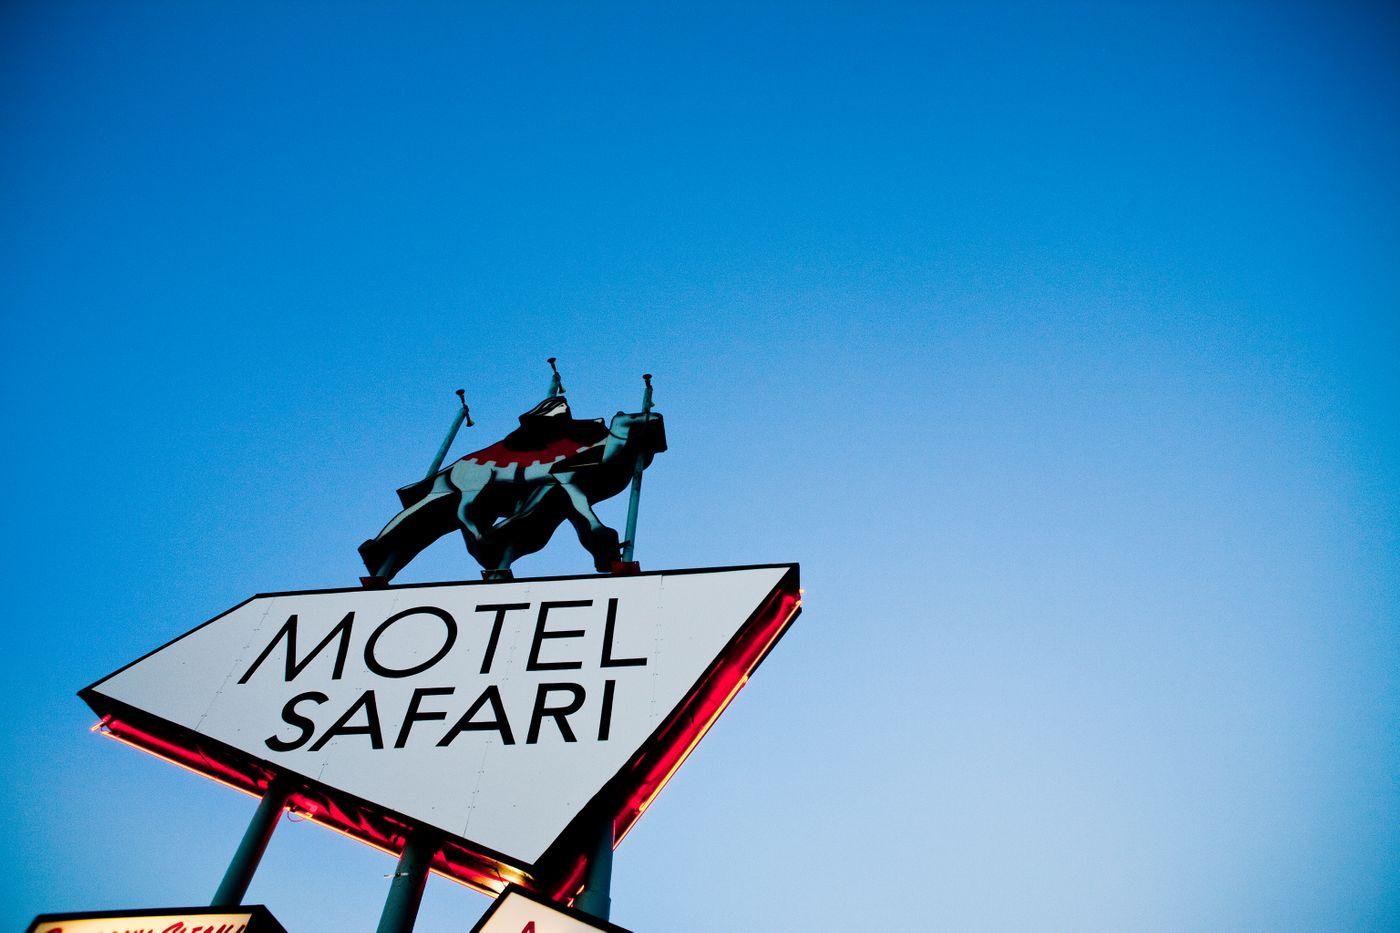 motel-web-2020-jpg-17-PRINT.jpg